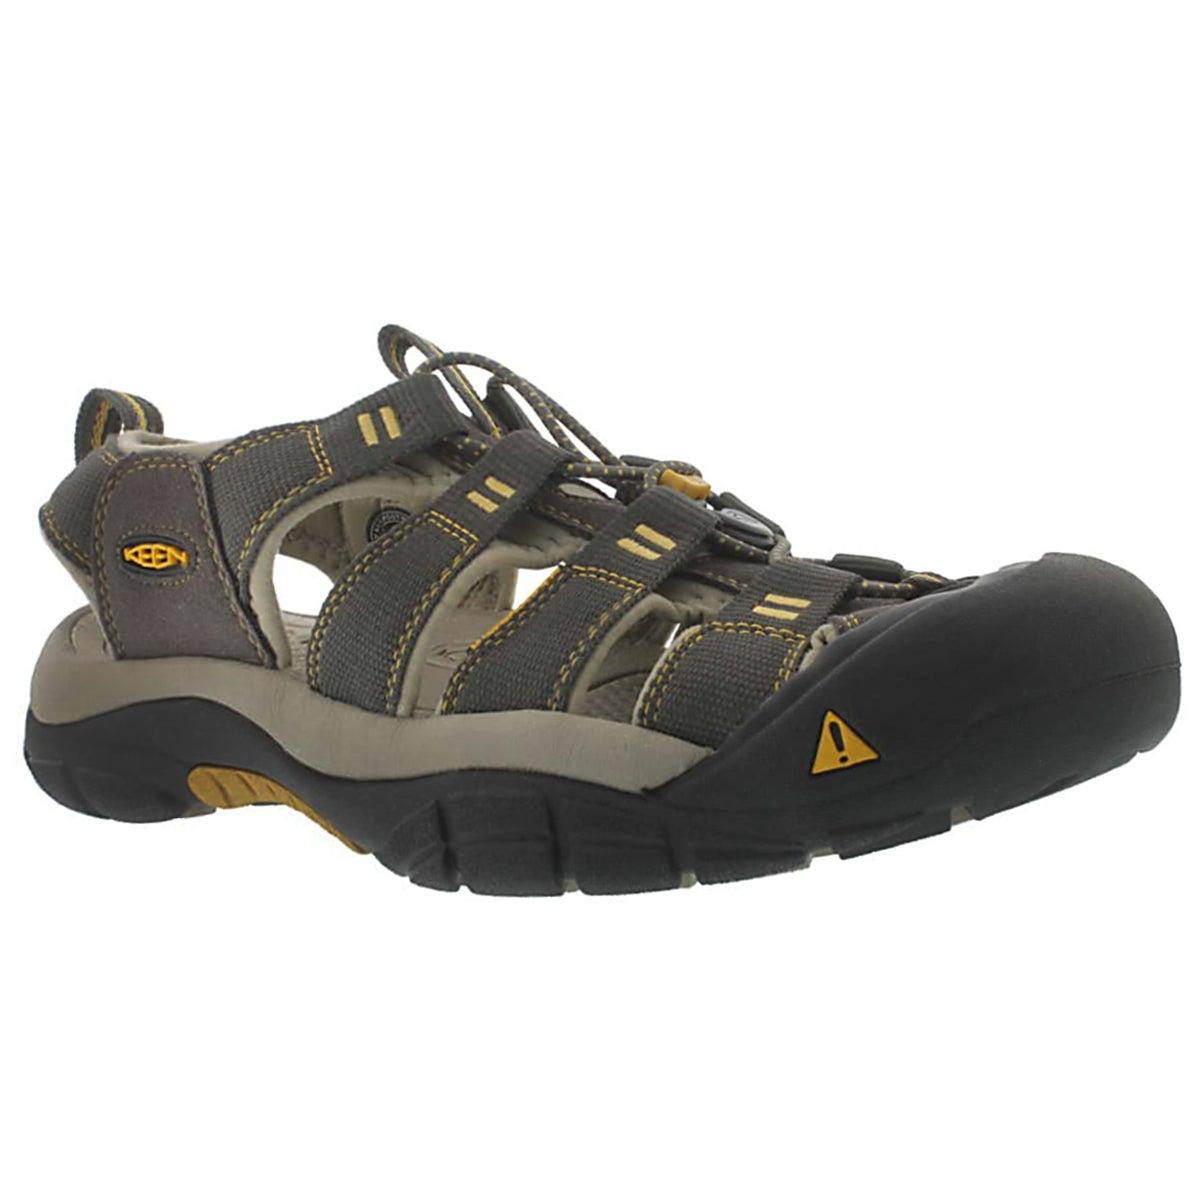 Mns Newport H2 raven/alum sport sandal